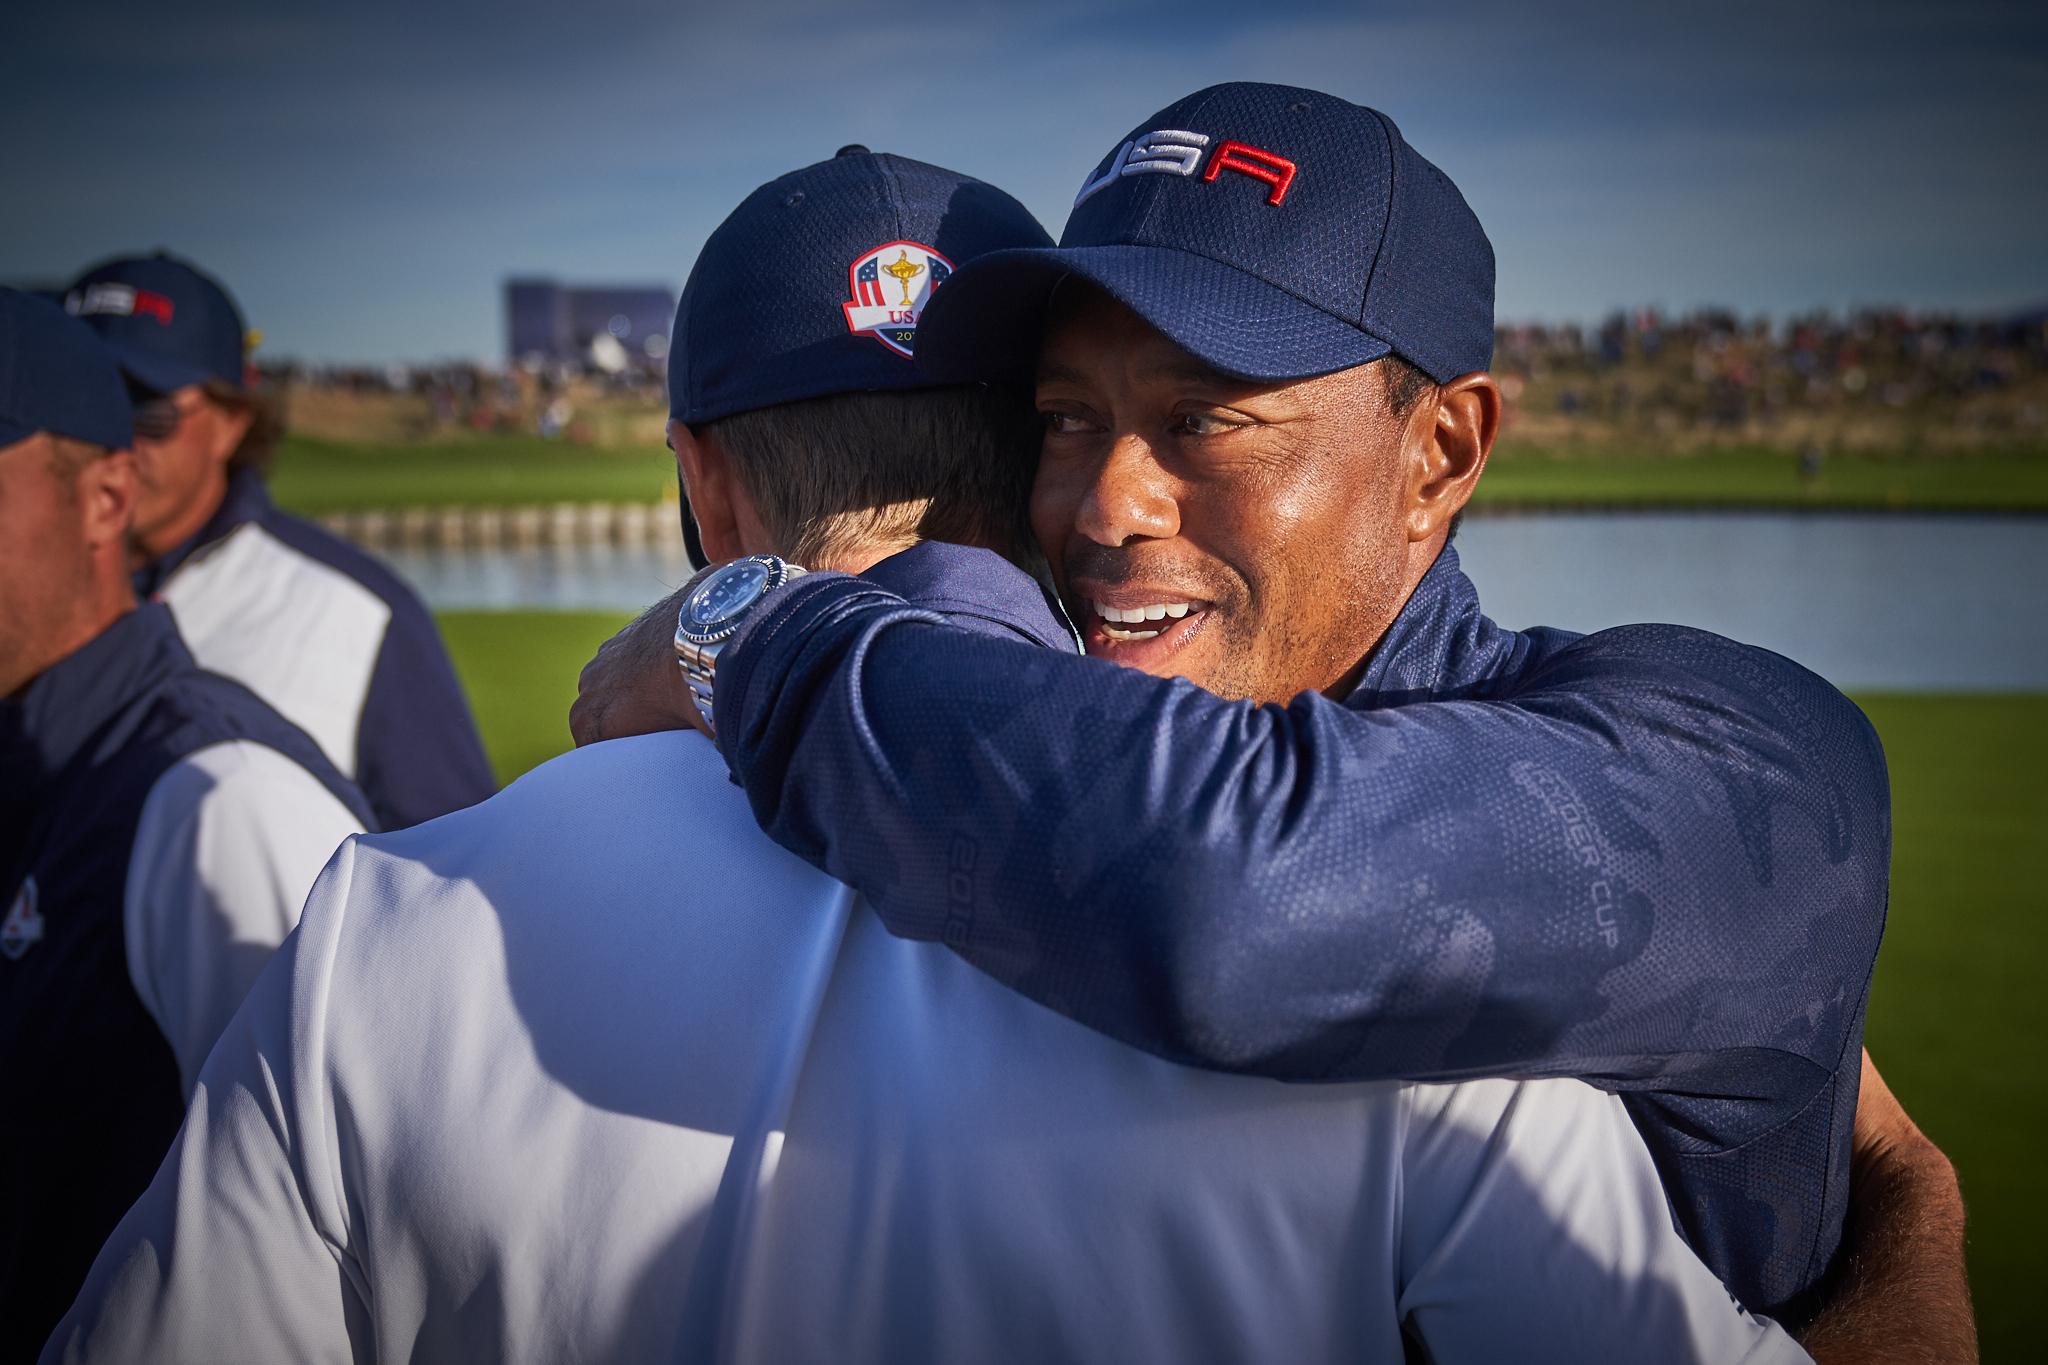 Tiger Woods and Jordan Spieth, Saturday Foursomes  Sony A7rIII, Sony 24-70mm f2.8 GM